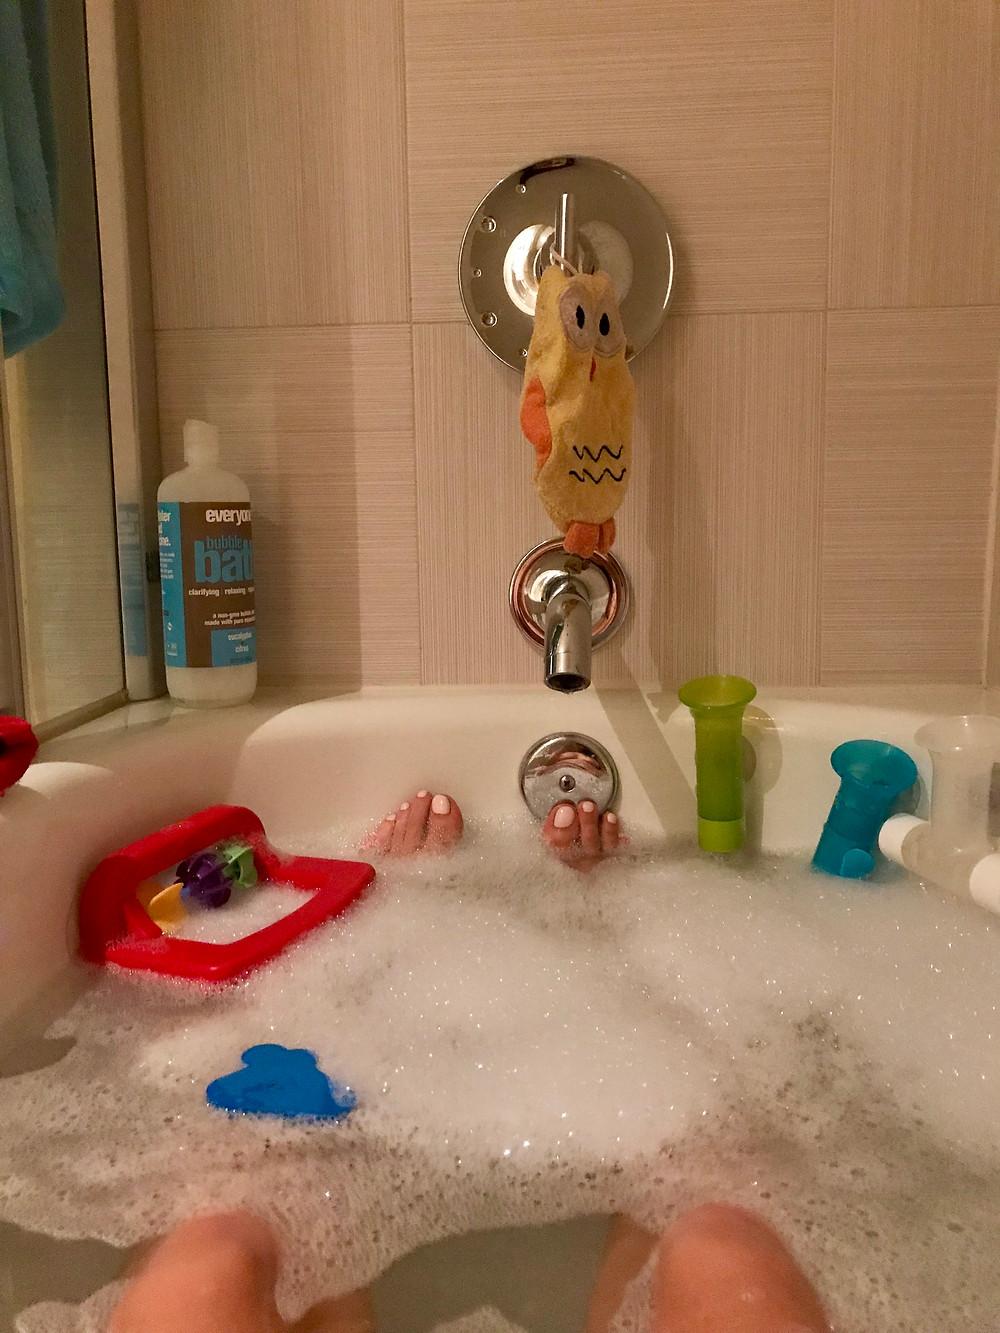 Julie in the bath